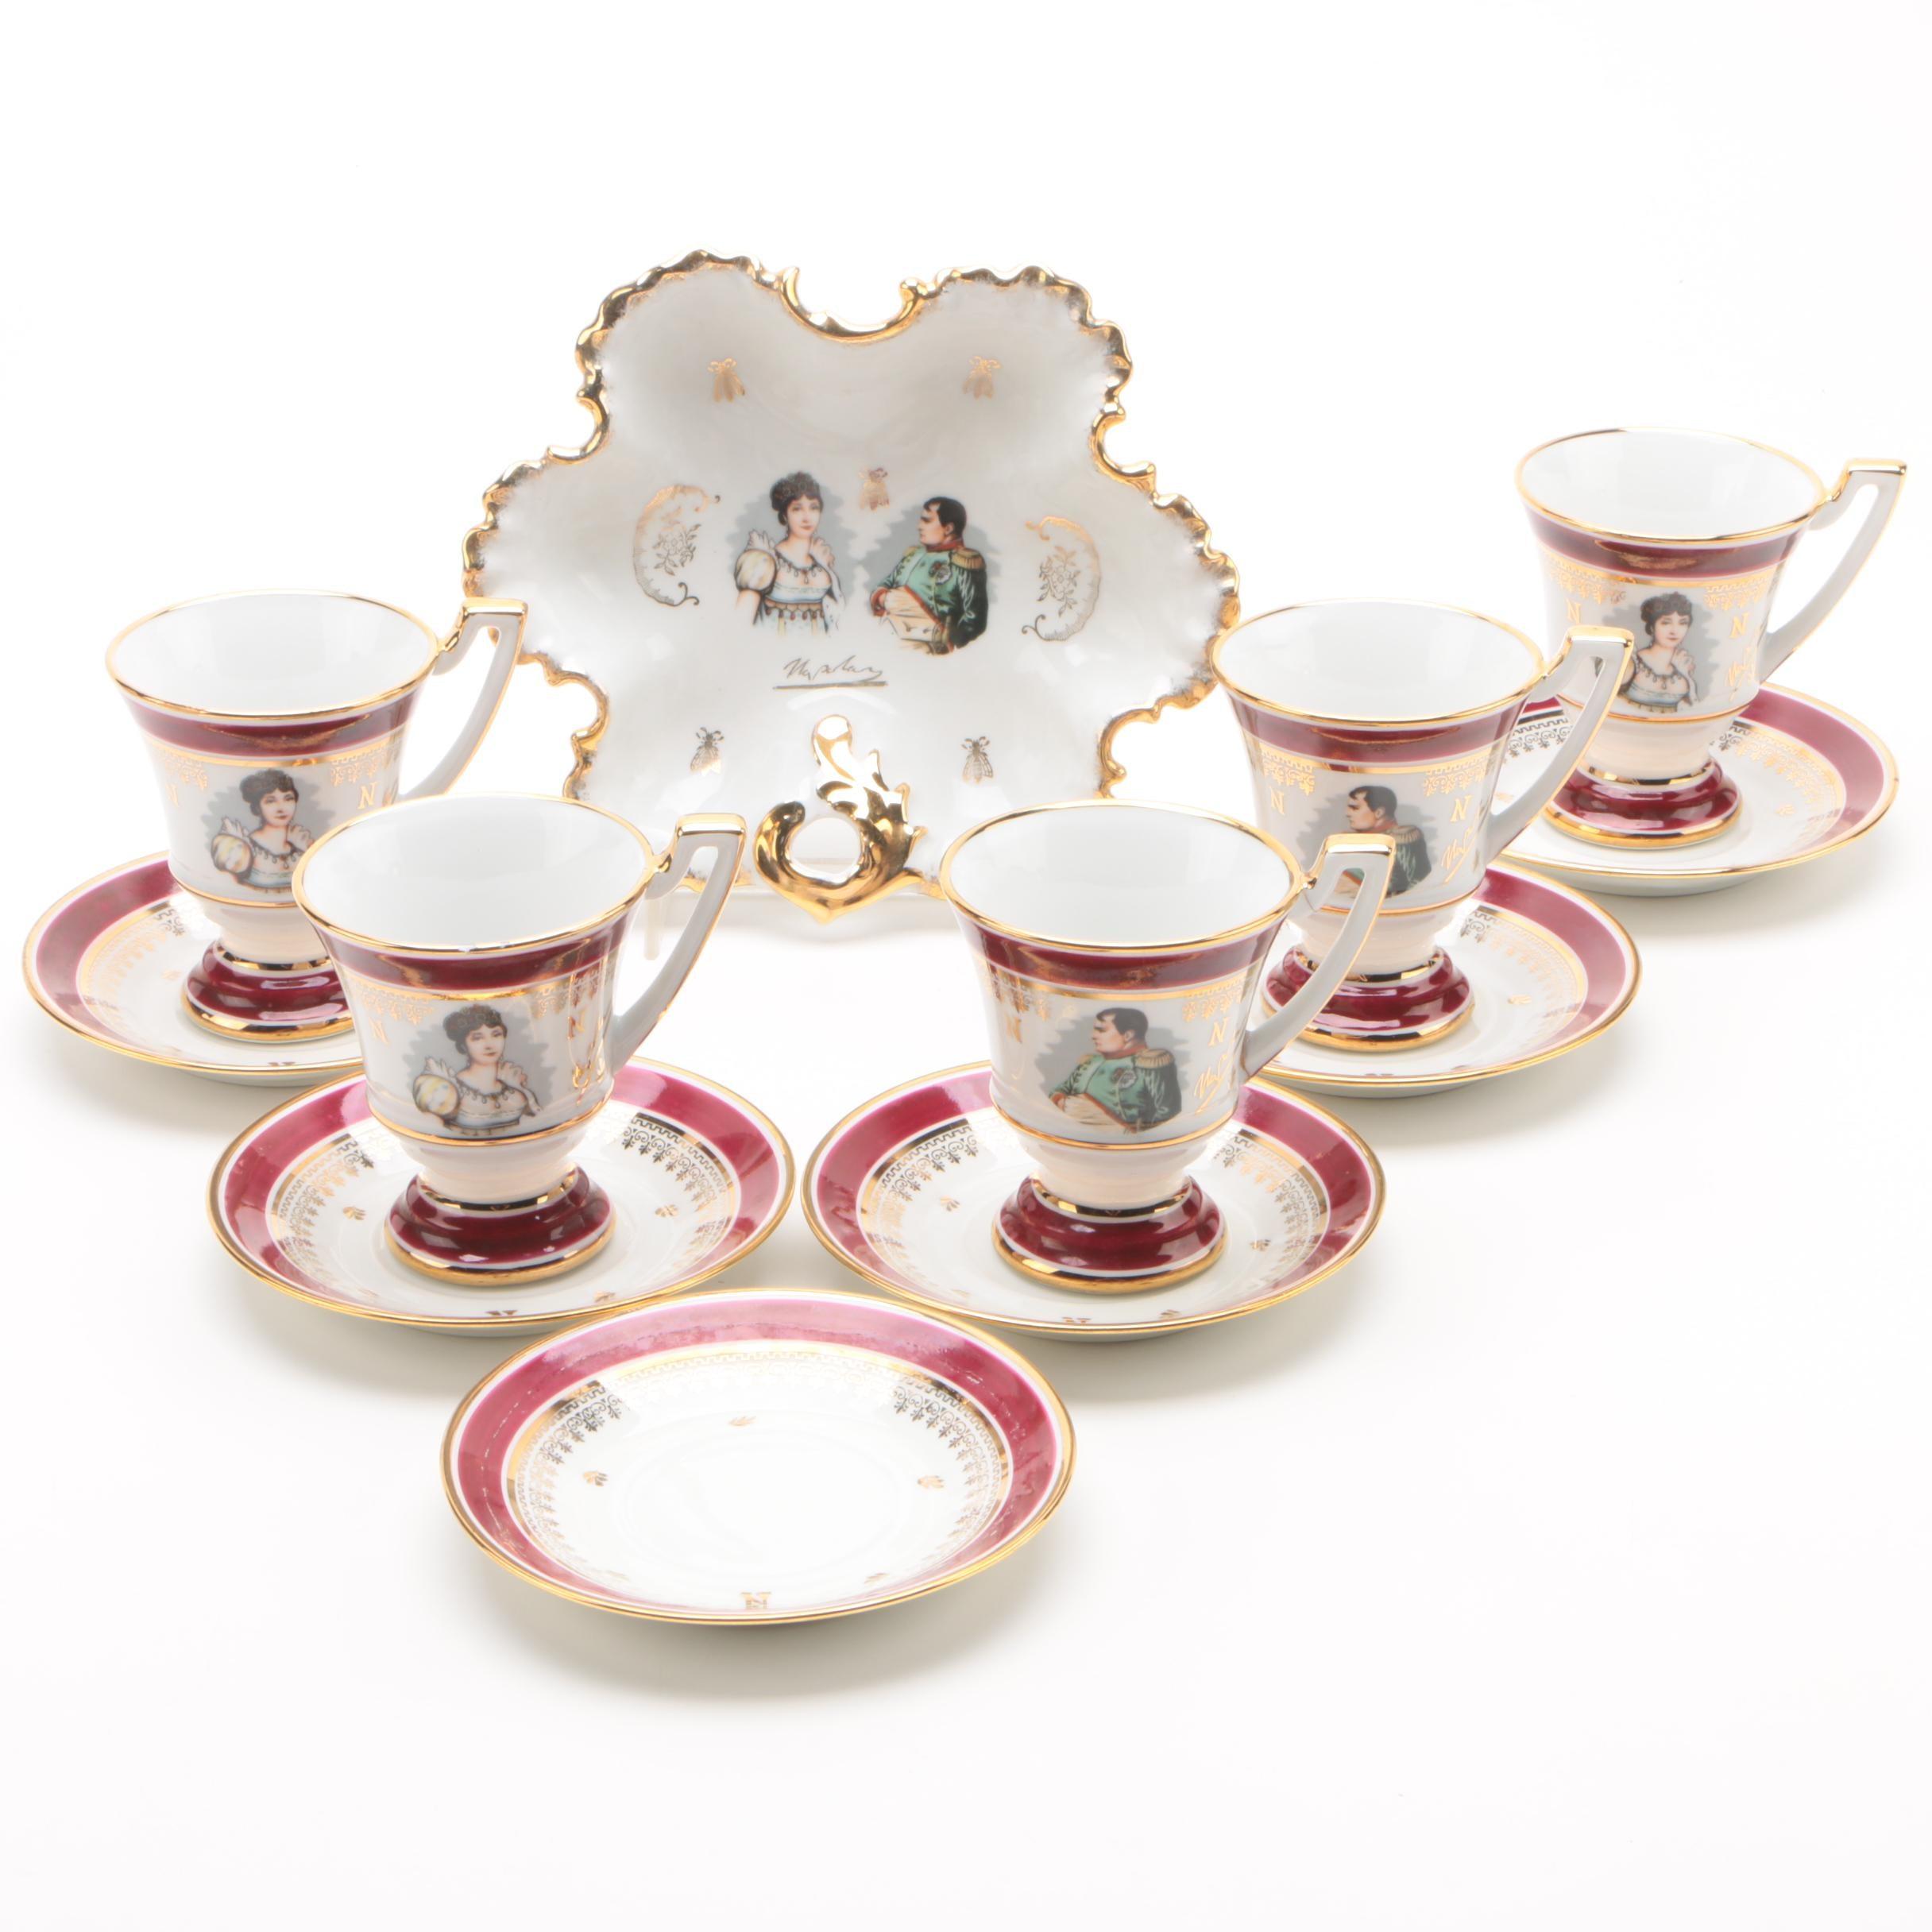 "Vintage Porcelaine de Lux ""Corse"" Cups and Saucers with Dish"